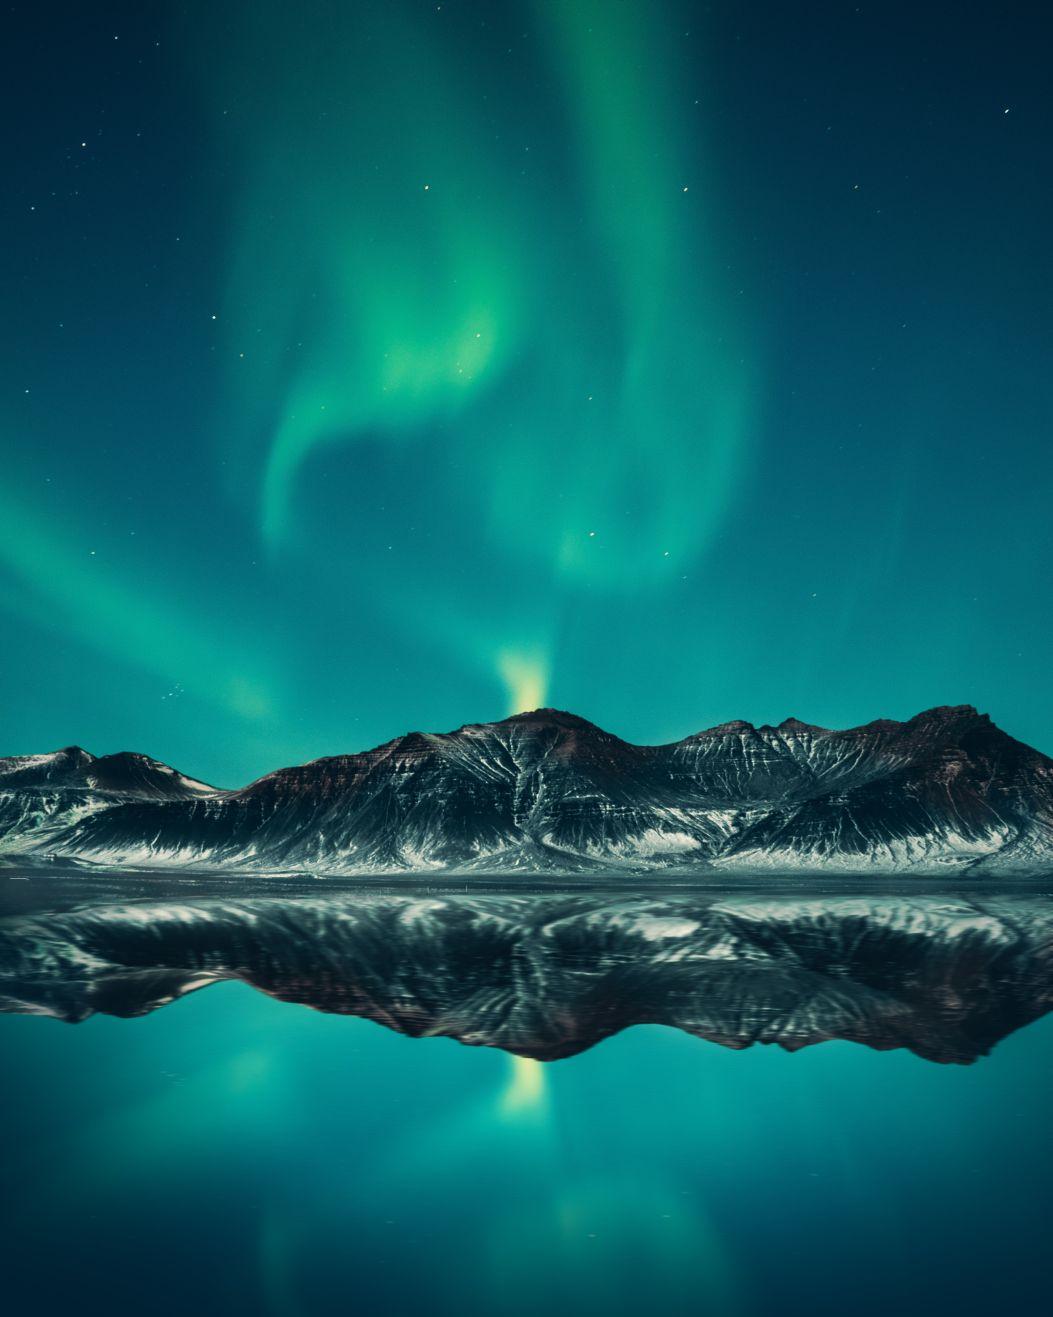 Iceland (Source: Pexels)